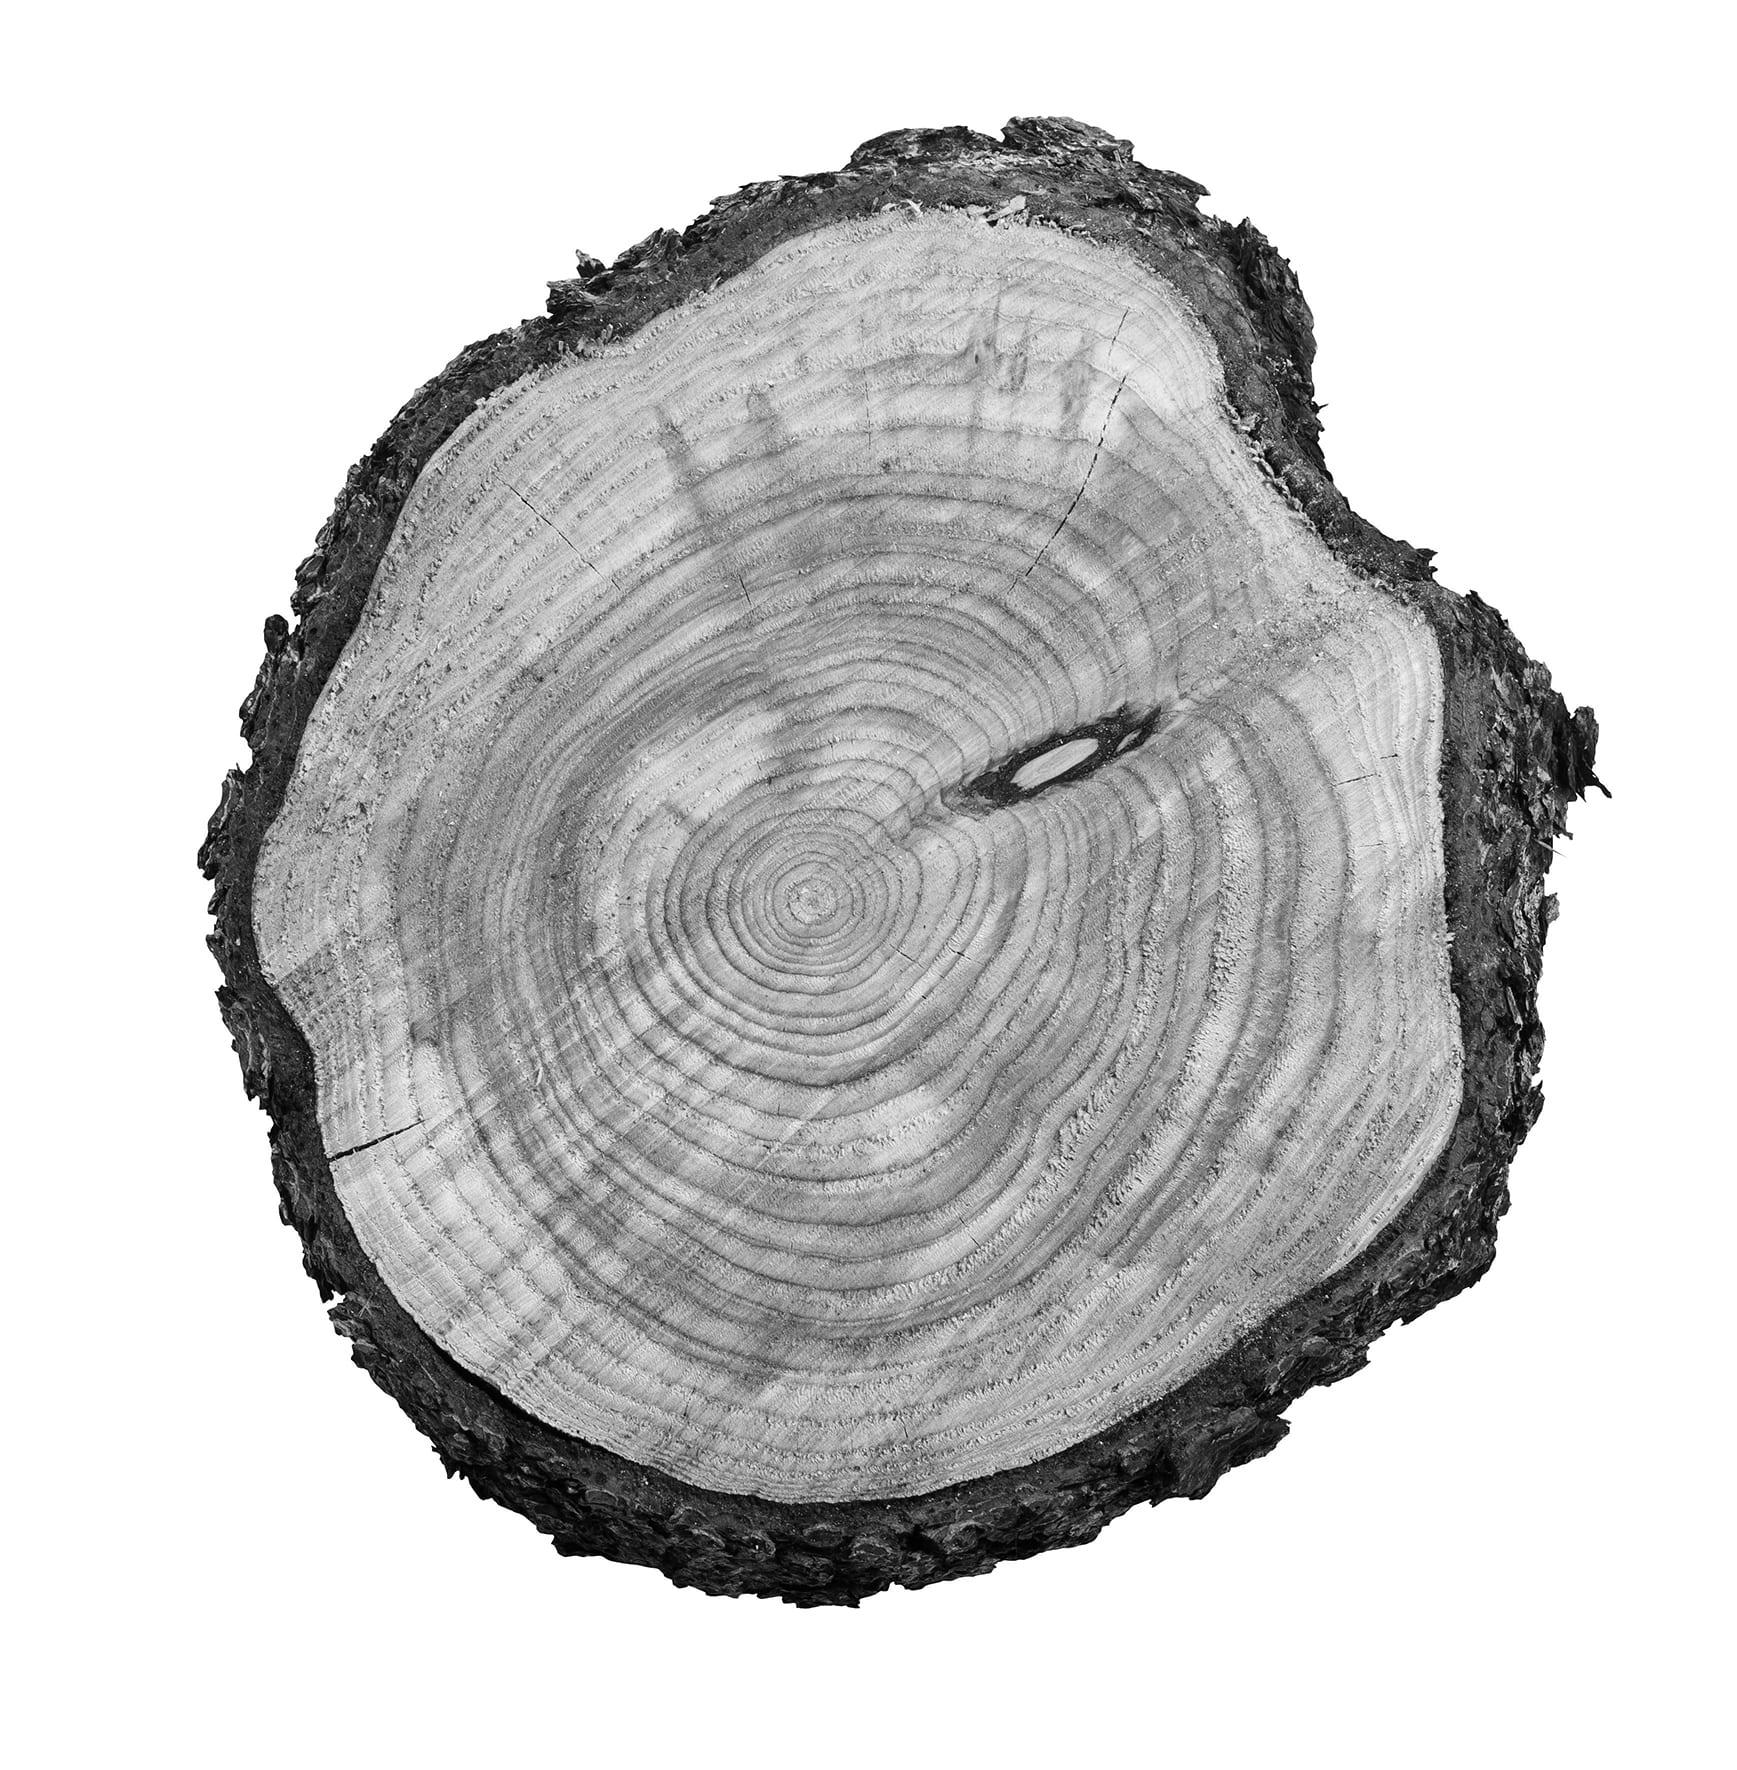 A black and white tree stump slice